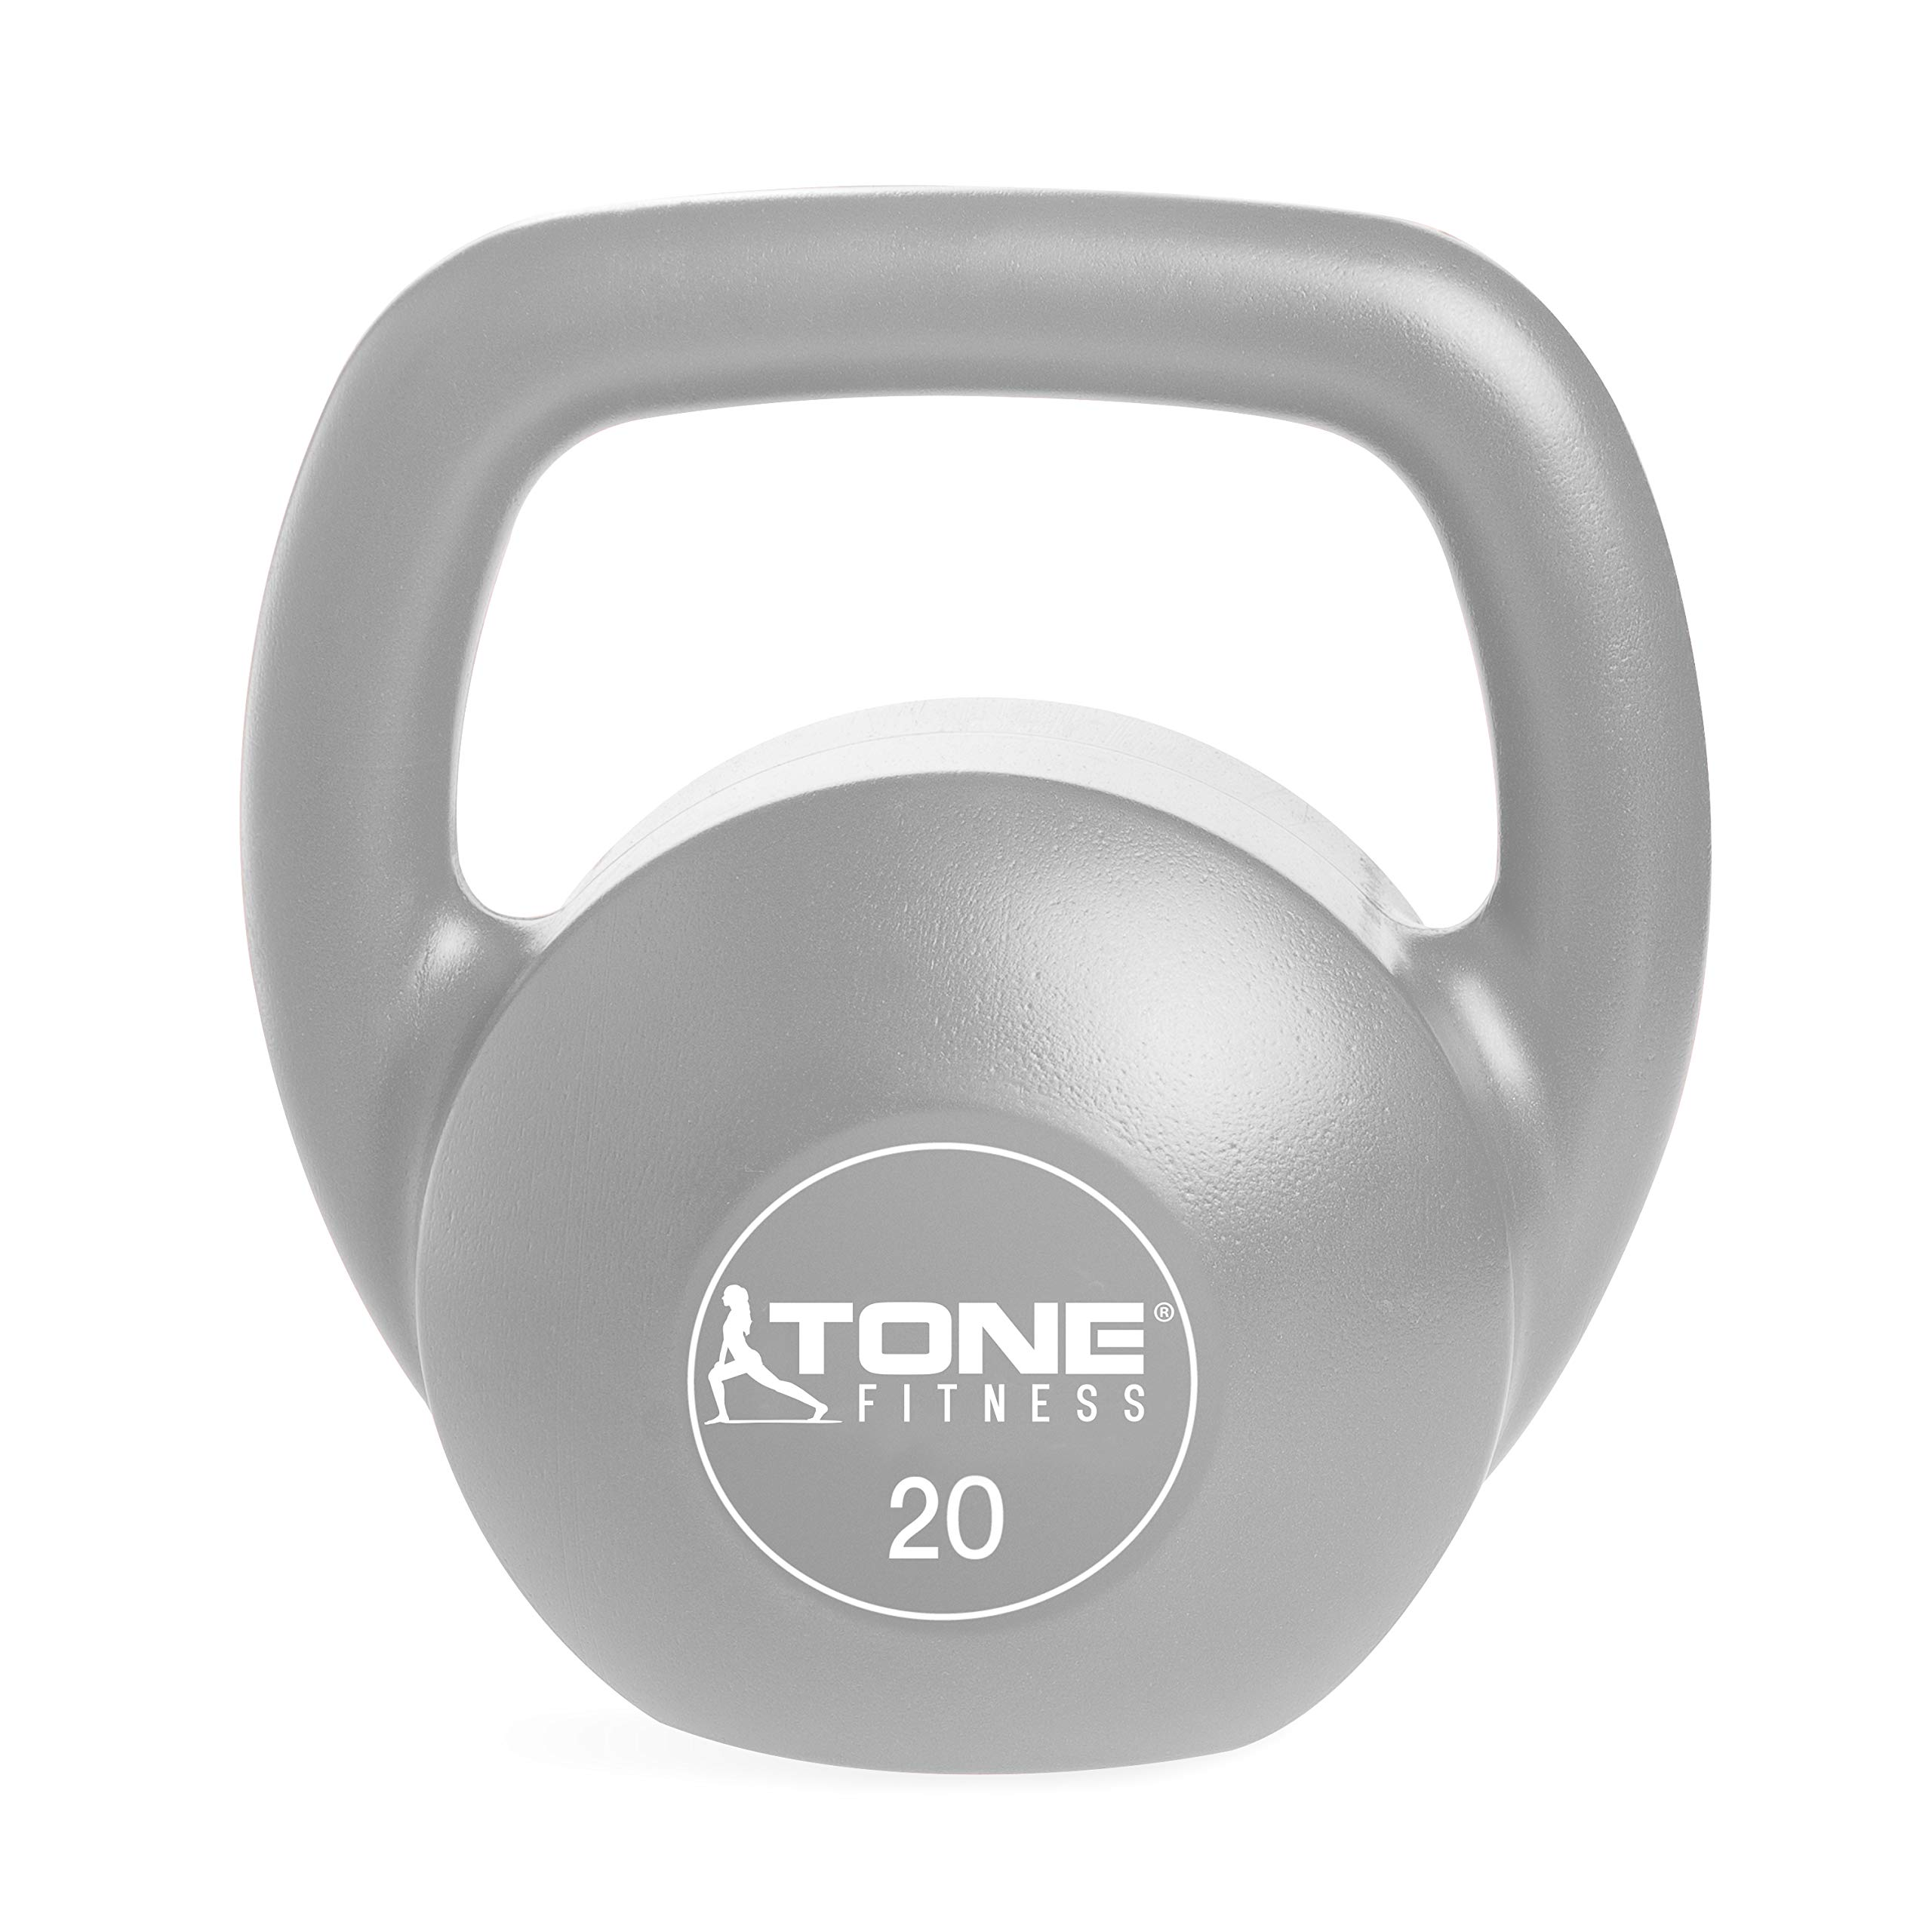 Tone Fitness SDKC2-TN020 Kettlebell, 20 lb by Tone Fitness